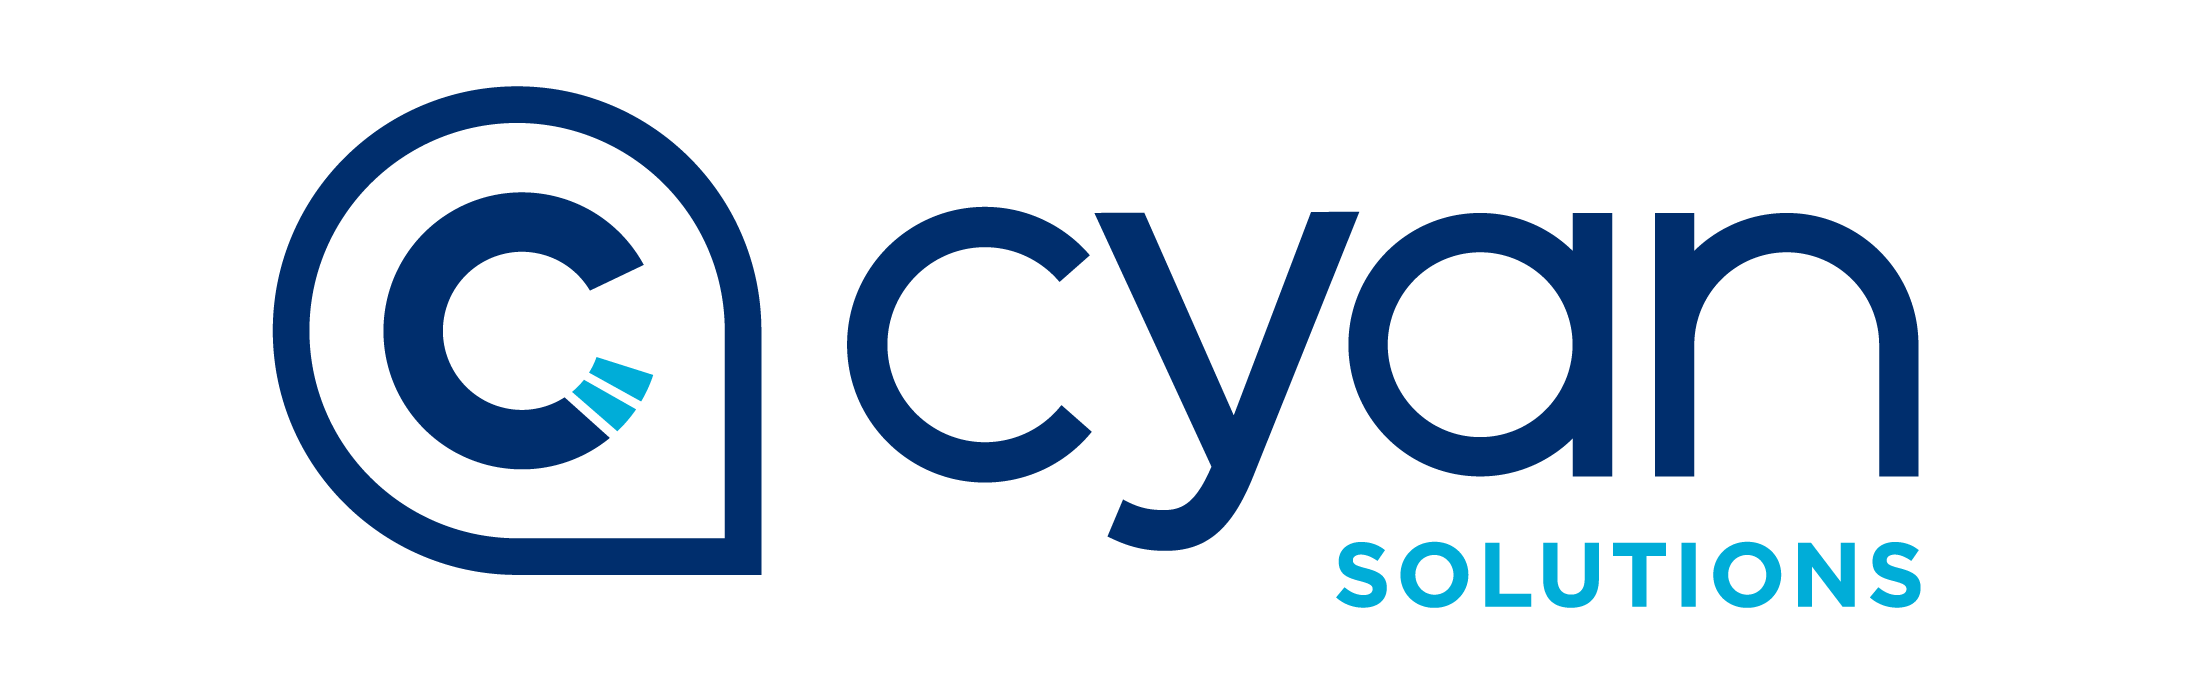 Cyan Solutions